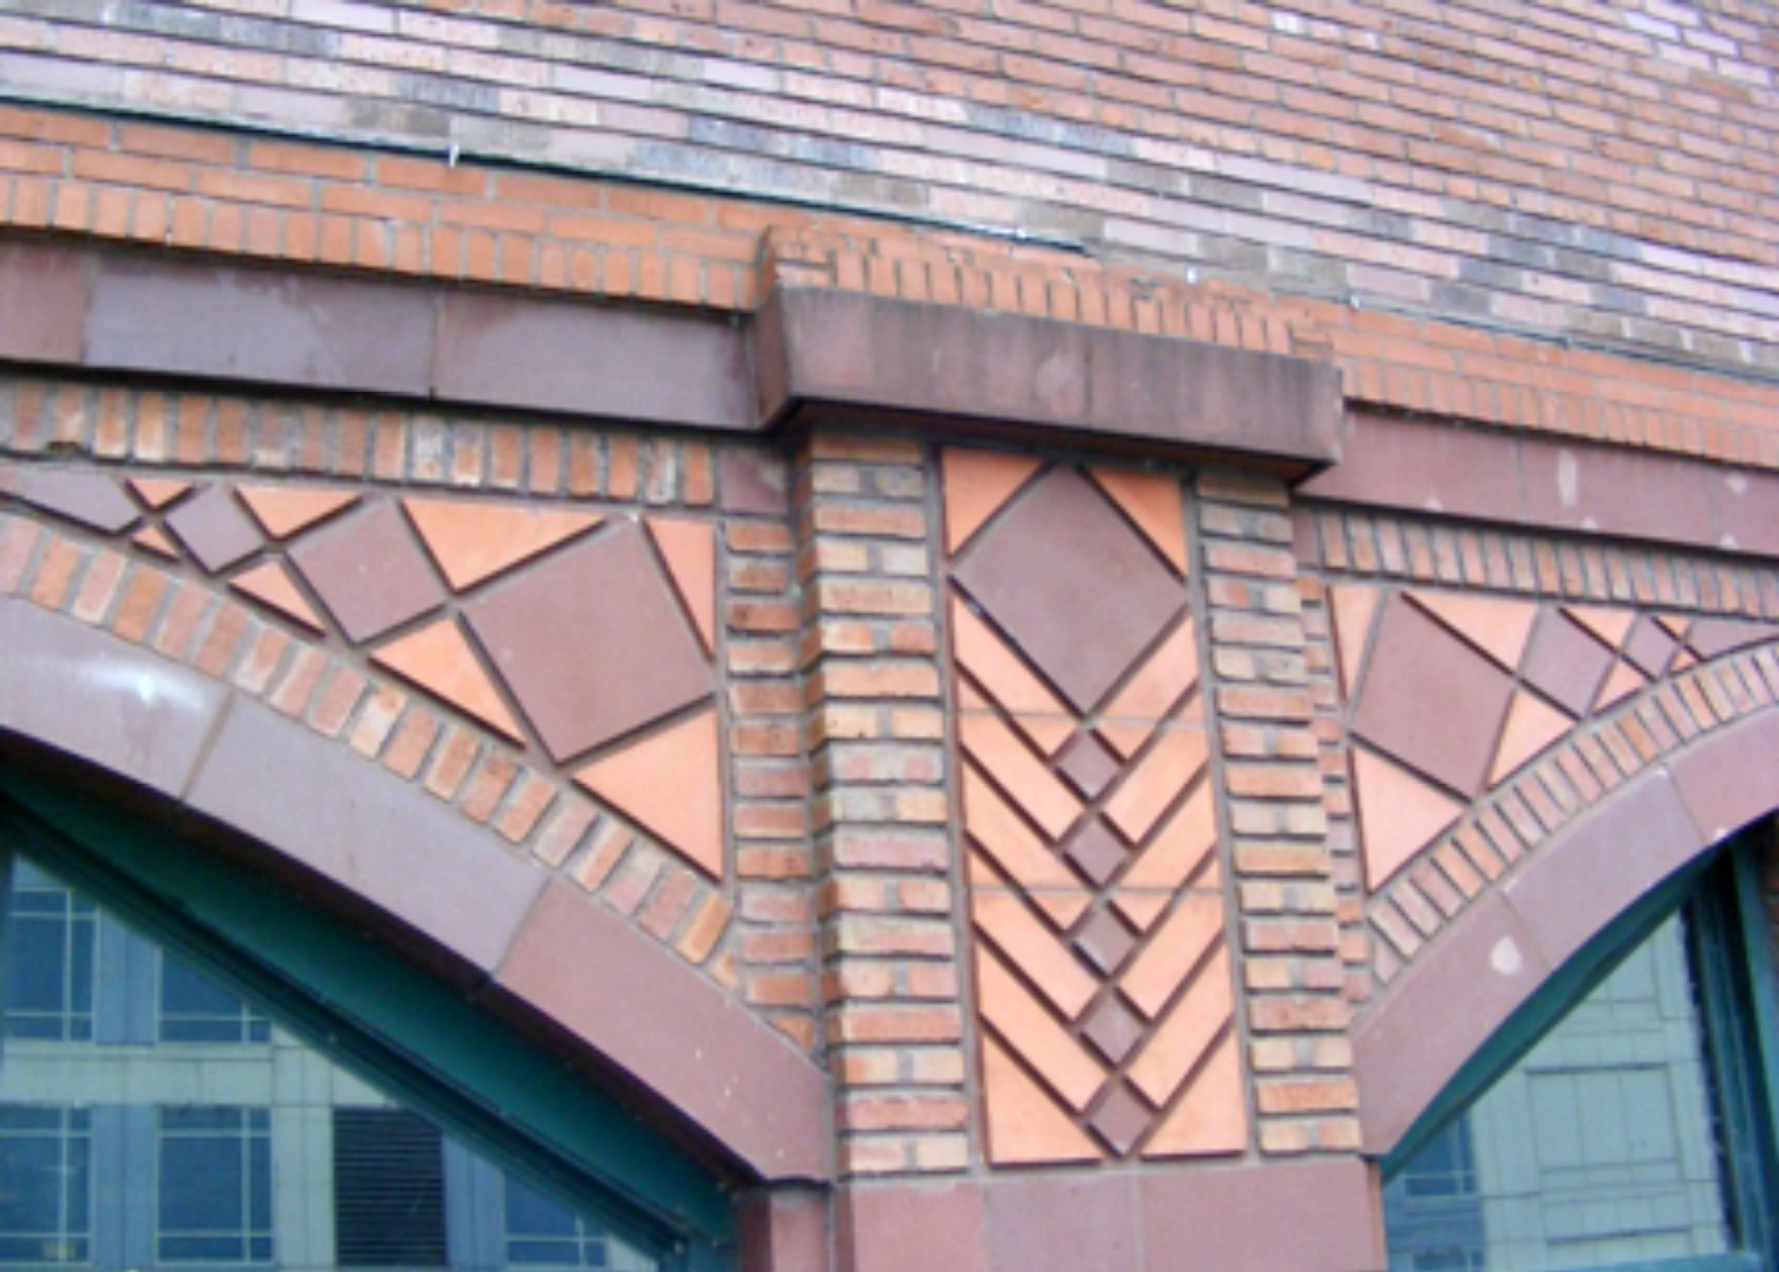 Terra cotta ornament